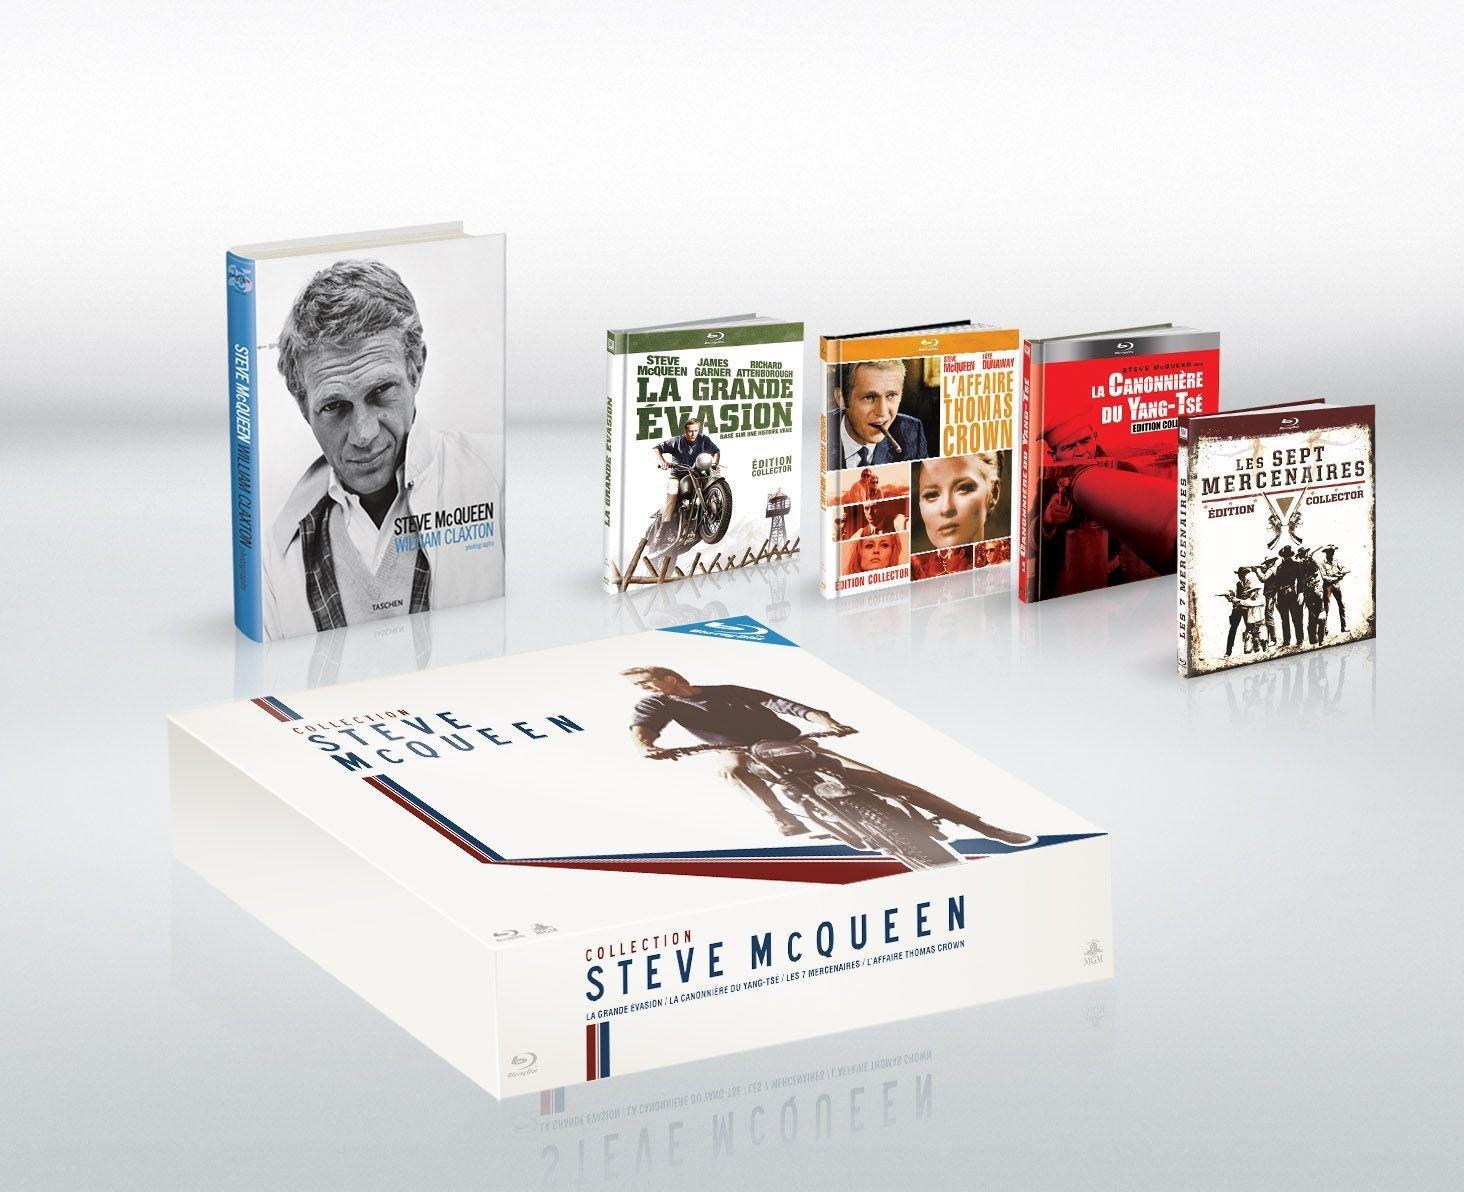 Coffret Blu-ray : Collection Steve McQueen - 4 films + superbe Livre ed. Taschen